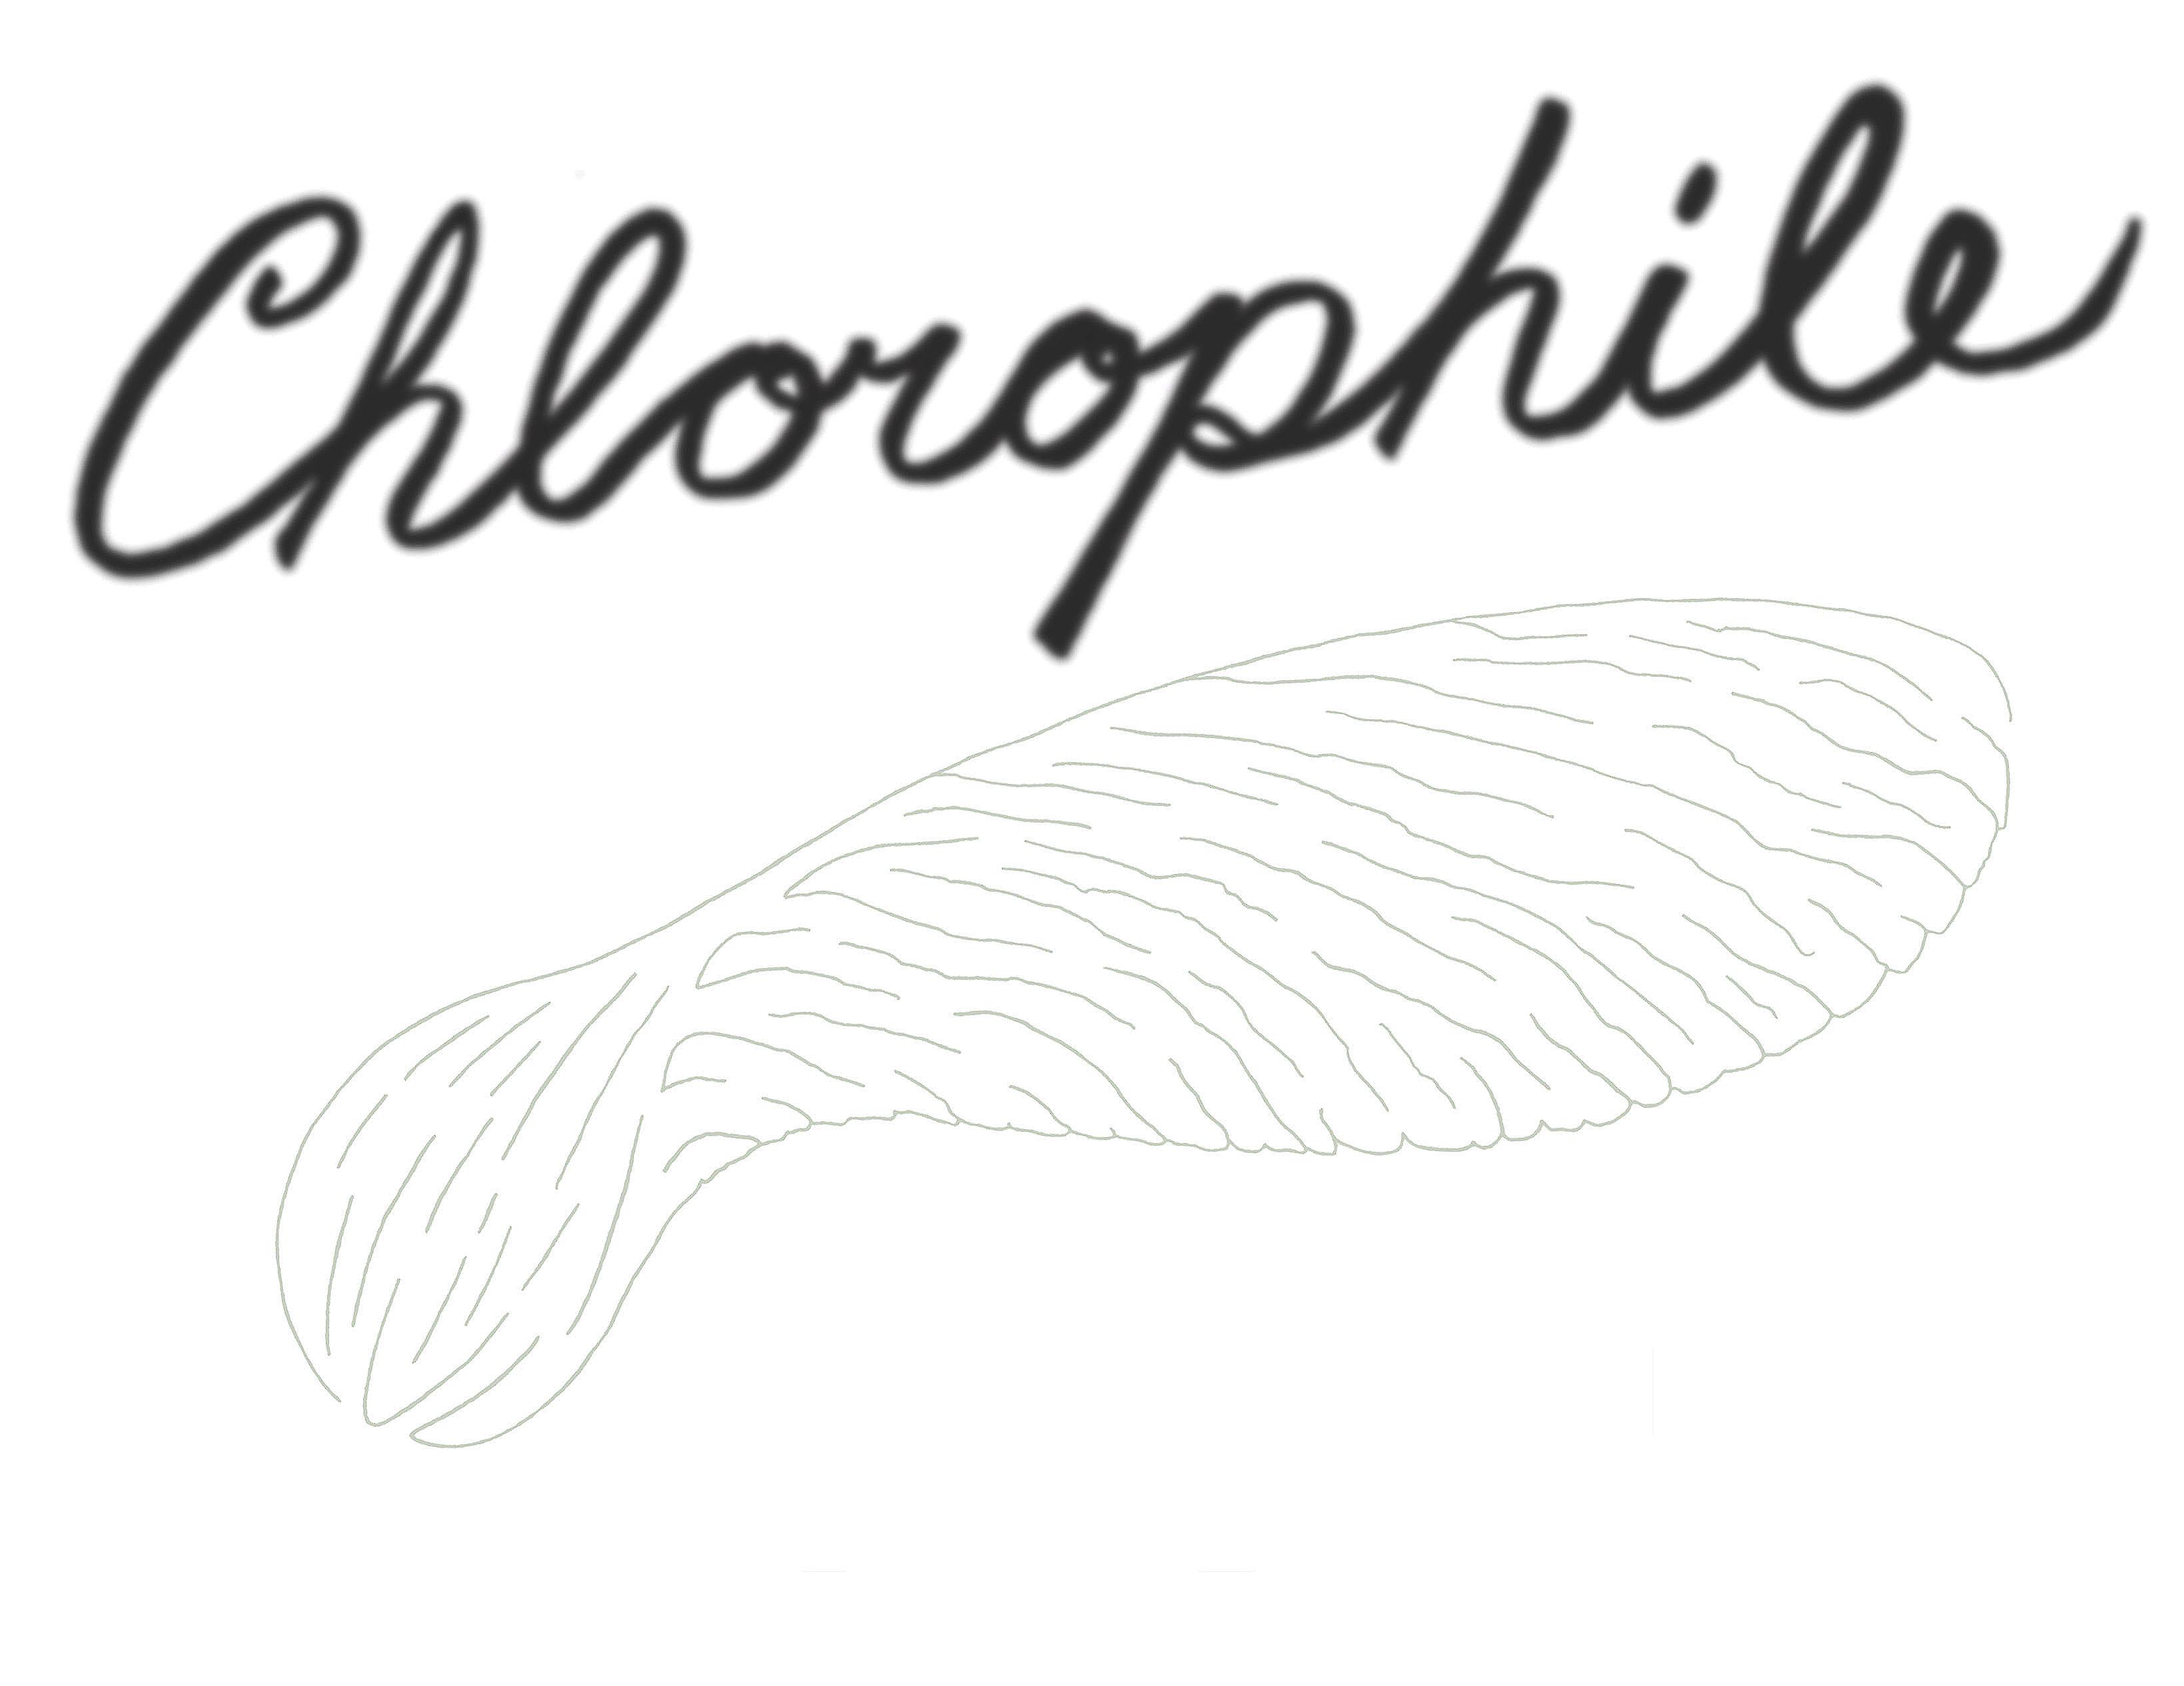 pgi6- Chlorophile